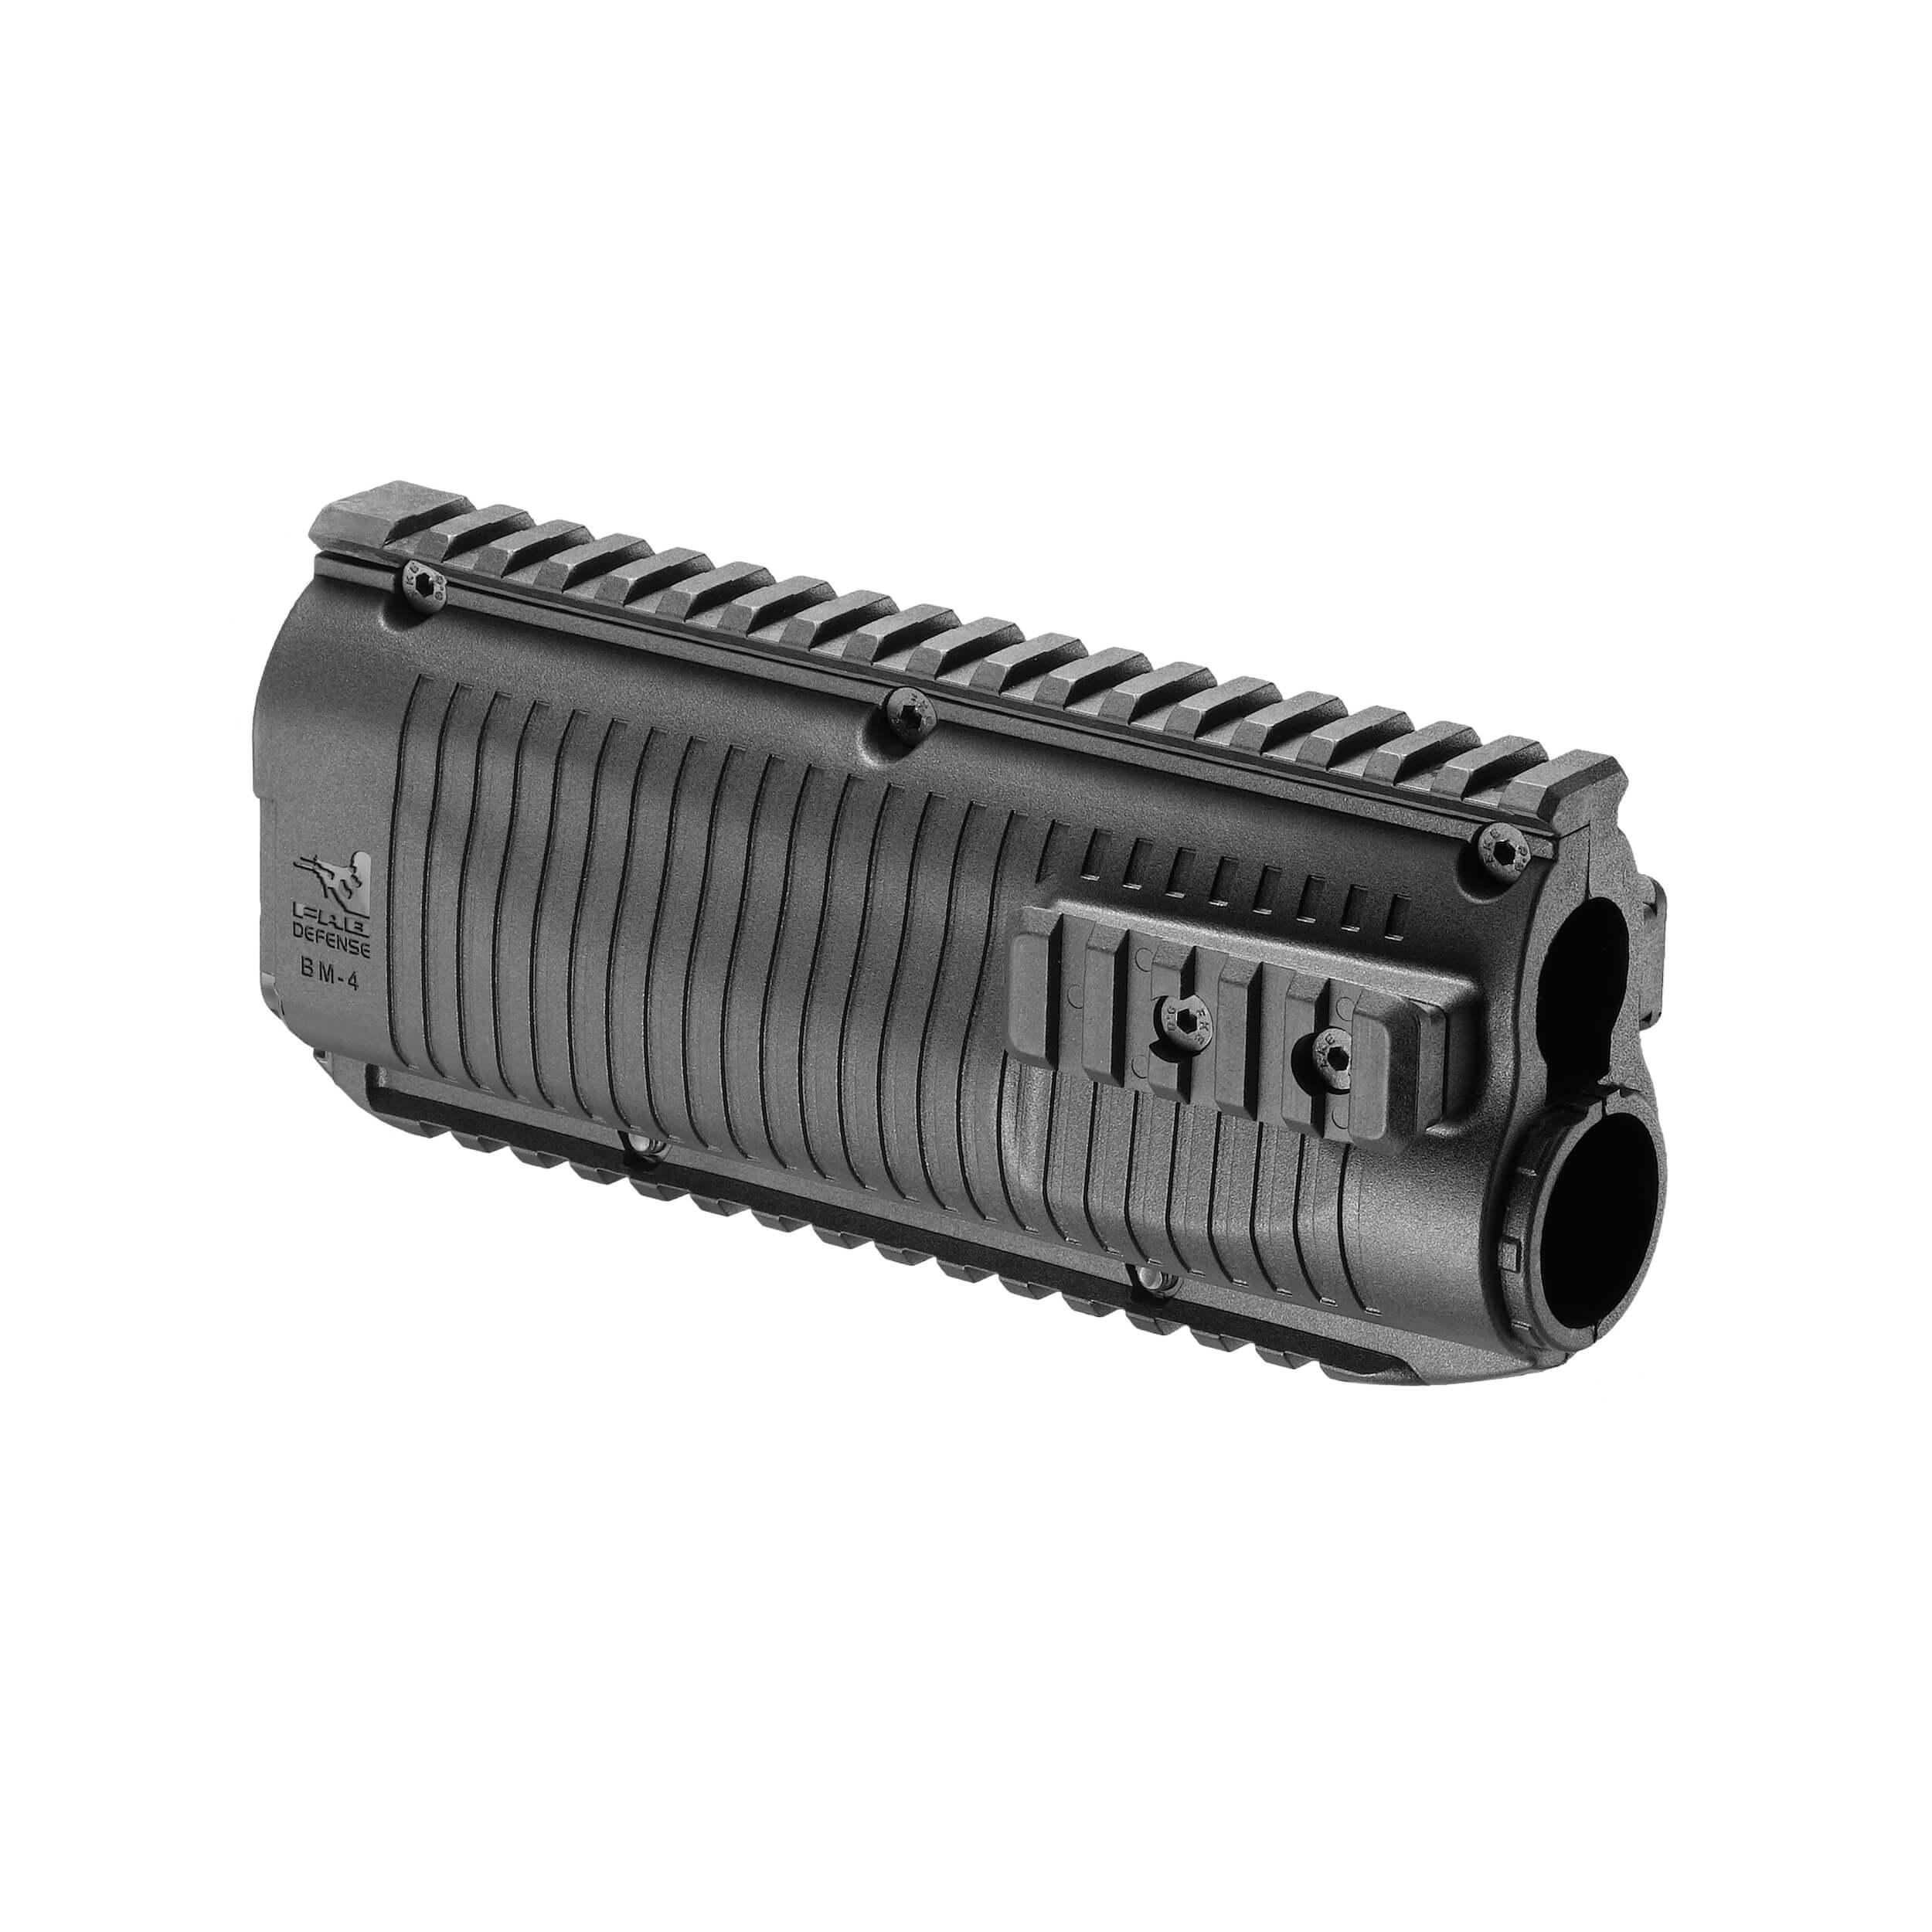 Benelli M4 Quad Rail Polymer Handguard